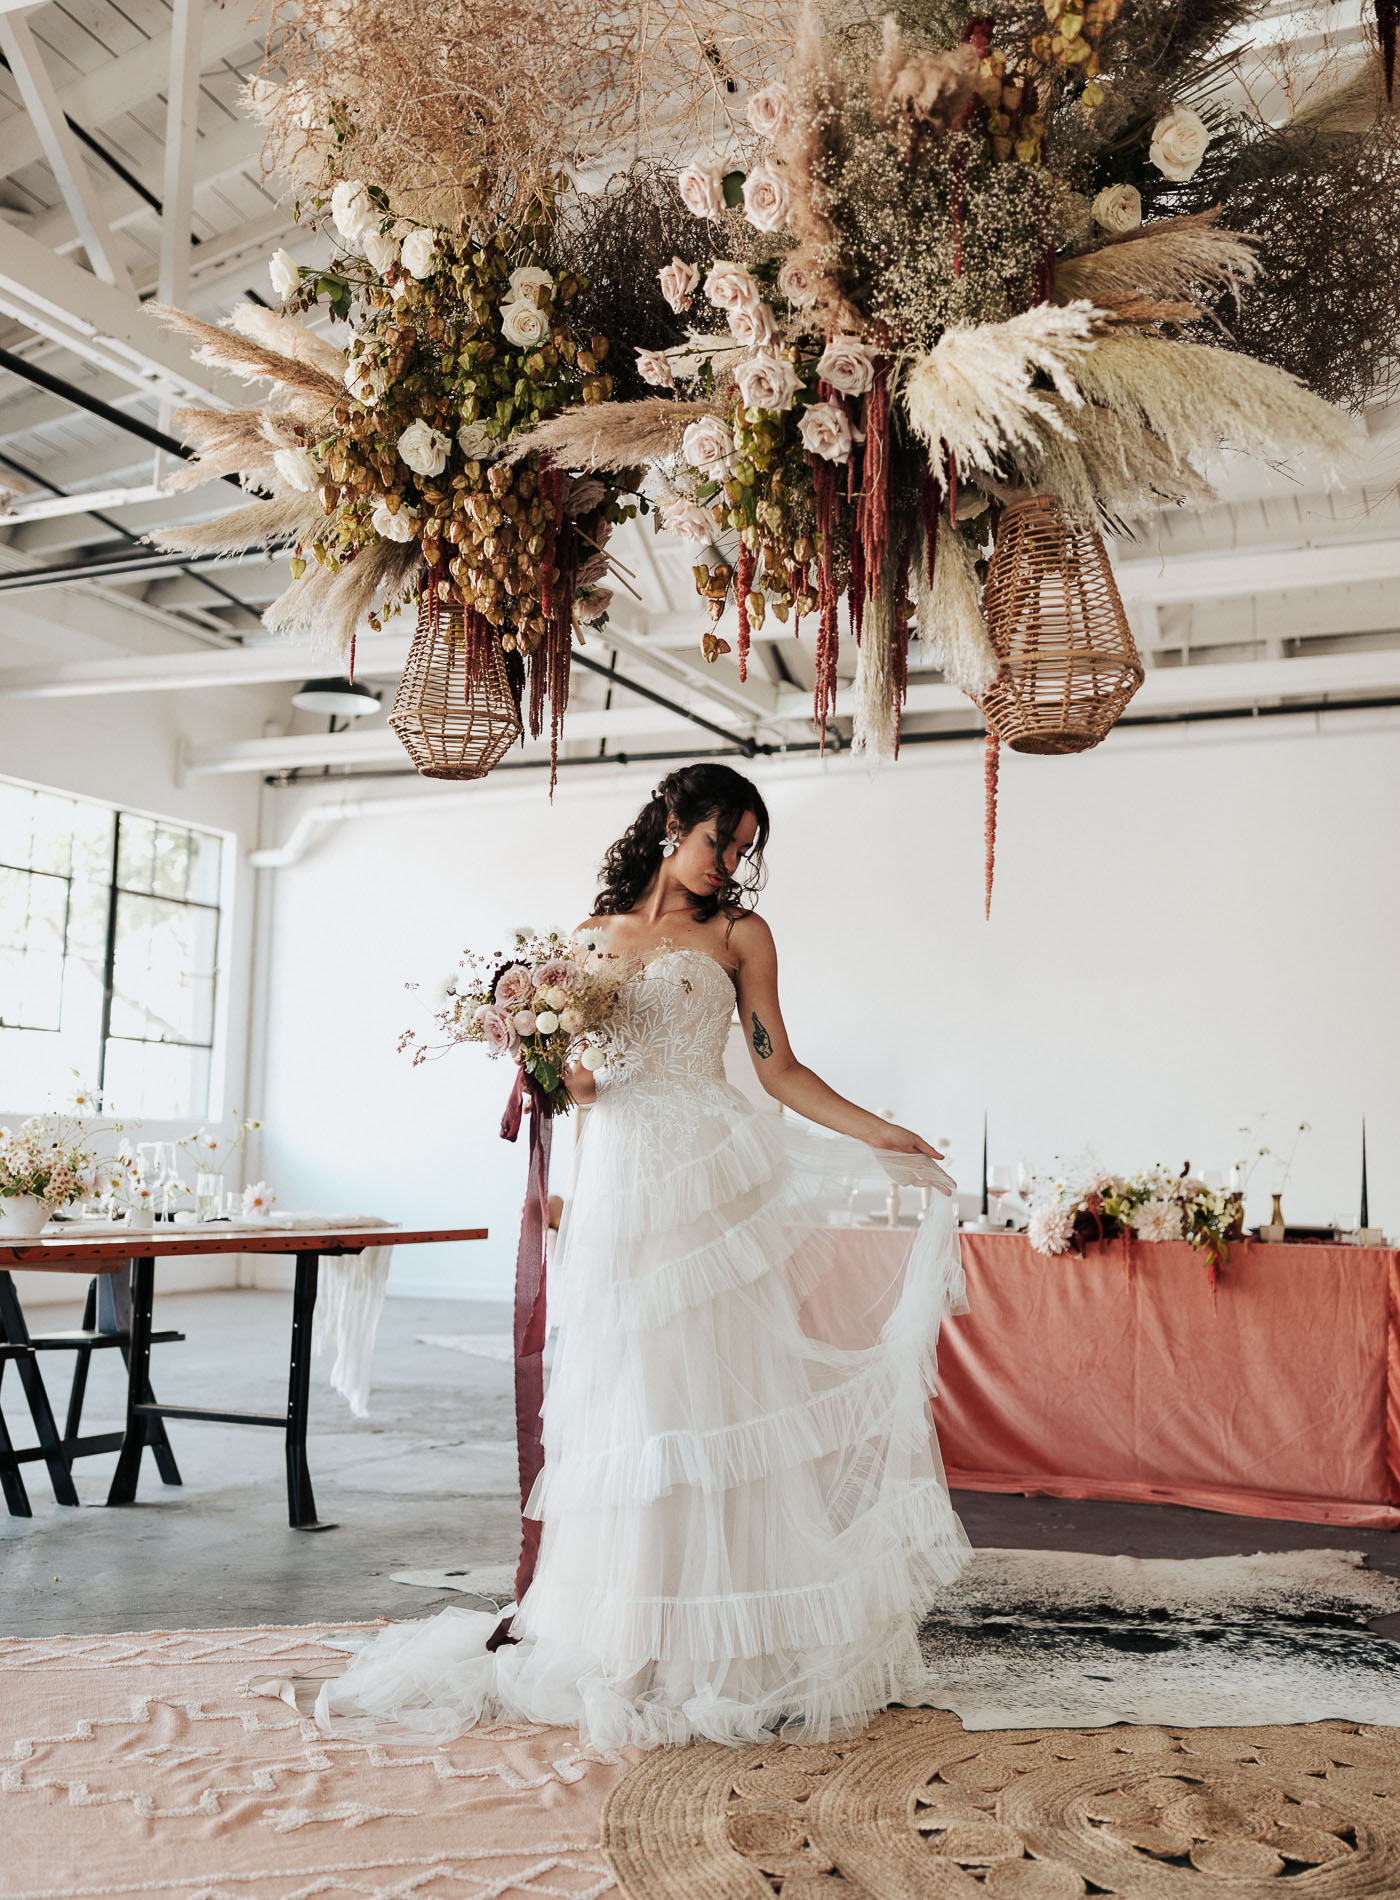 Edgy Modern Wedding Inspiration